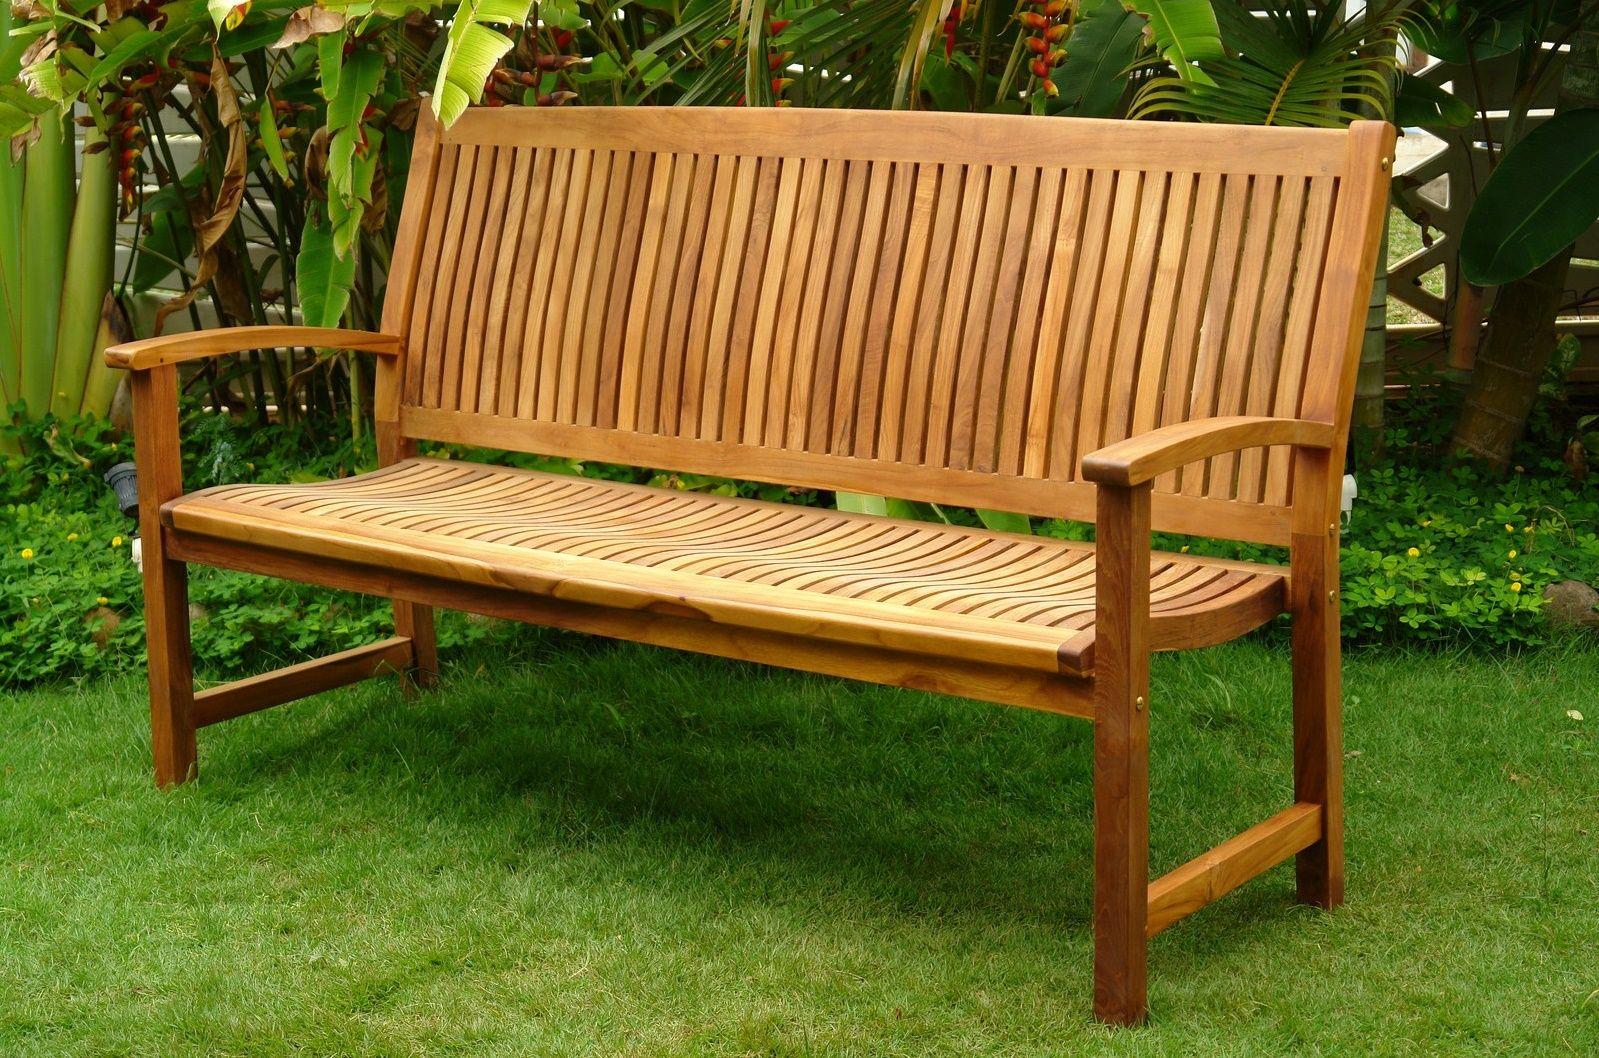 Gartenbank Gusseisen Holz Mit Bildern Gartenbank Gusseisen